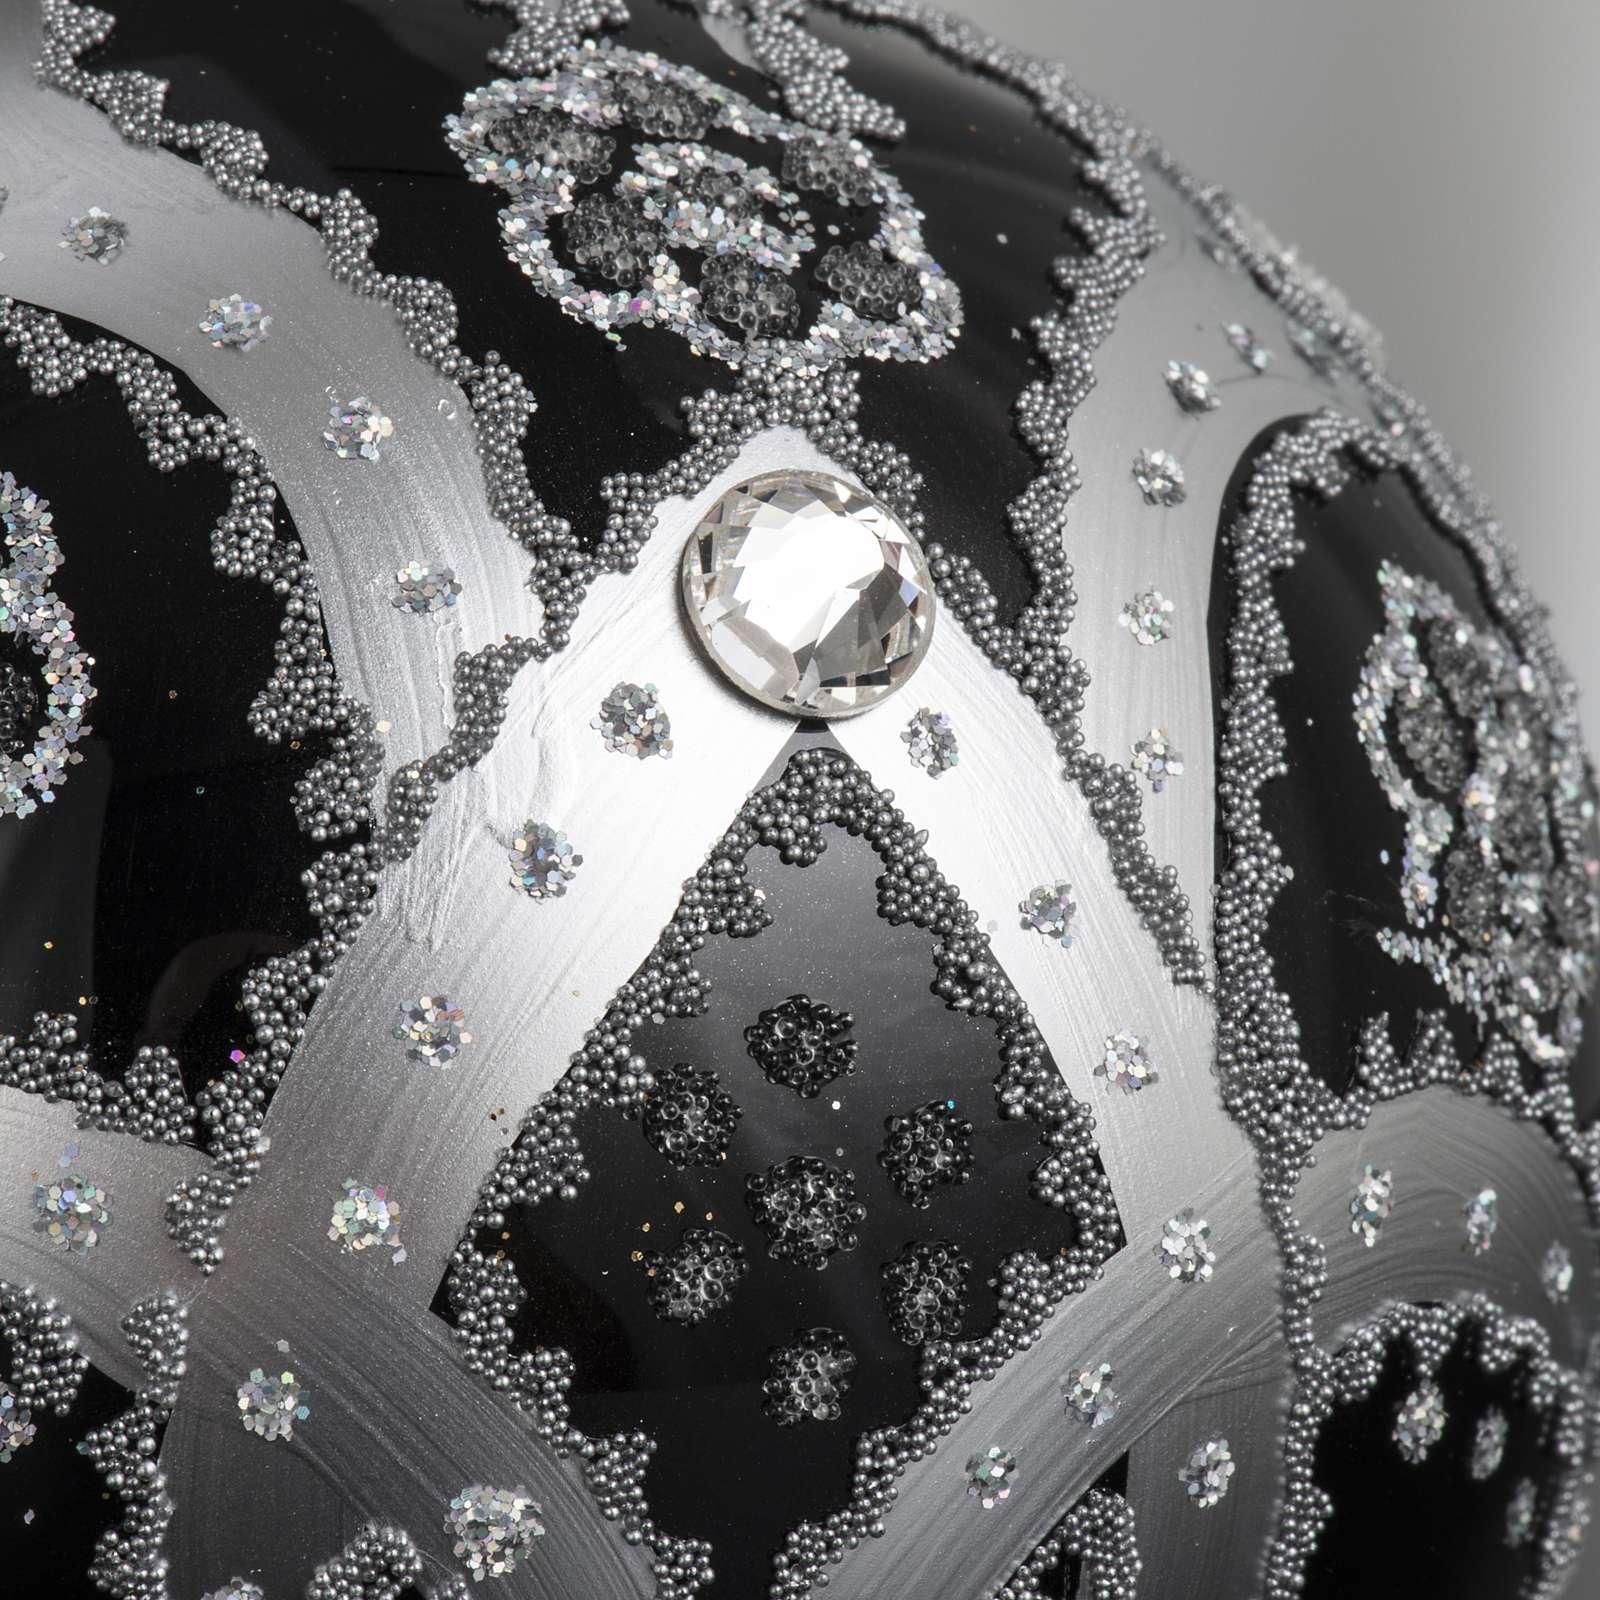 Addobbo albero vetro nero argento 10 cm 4